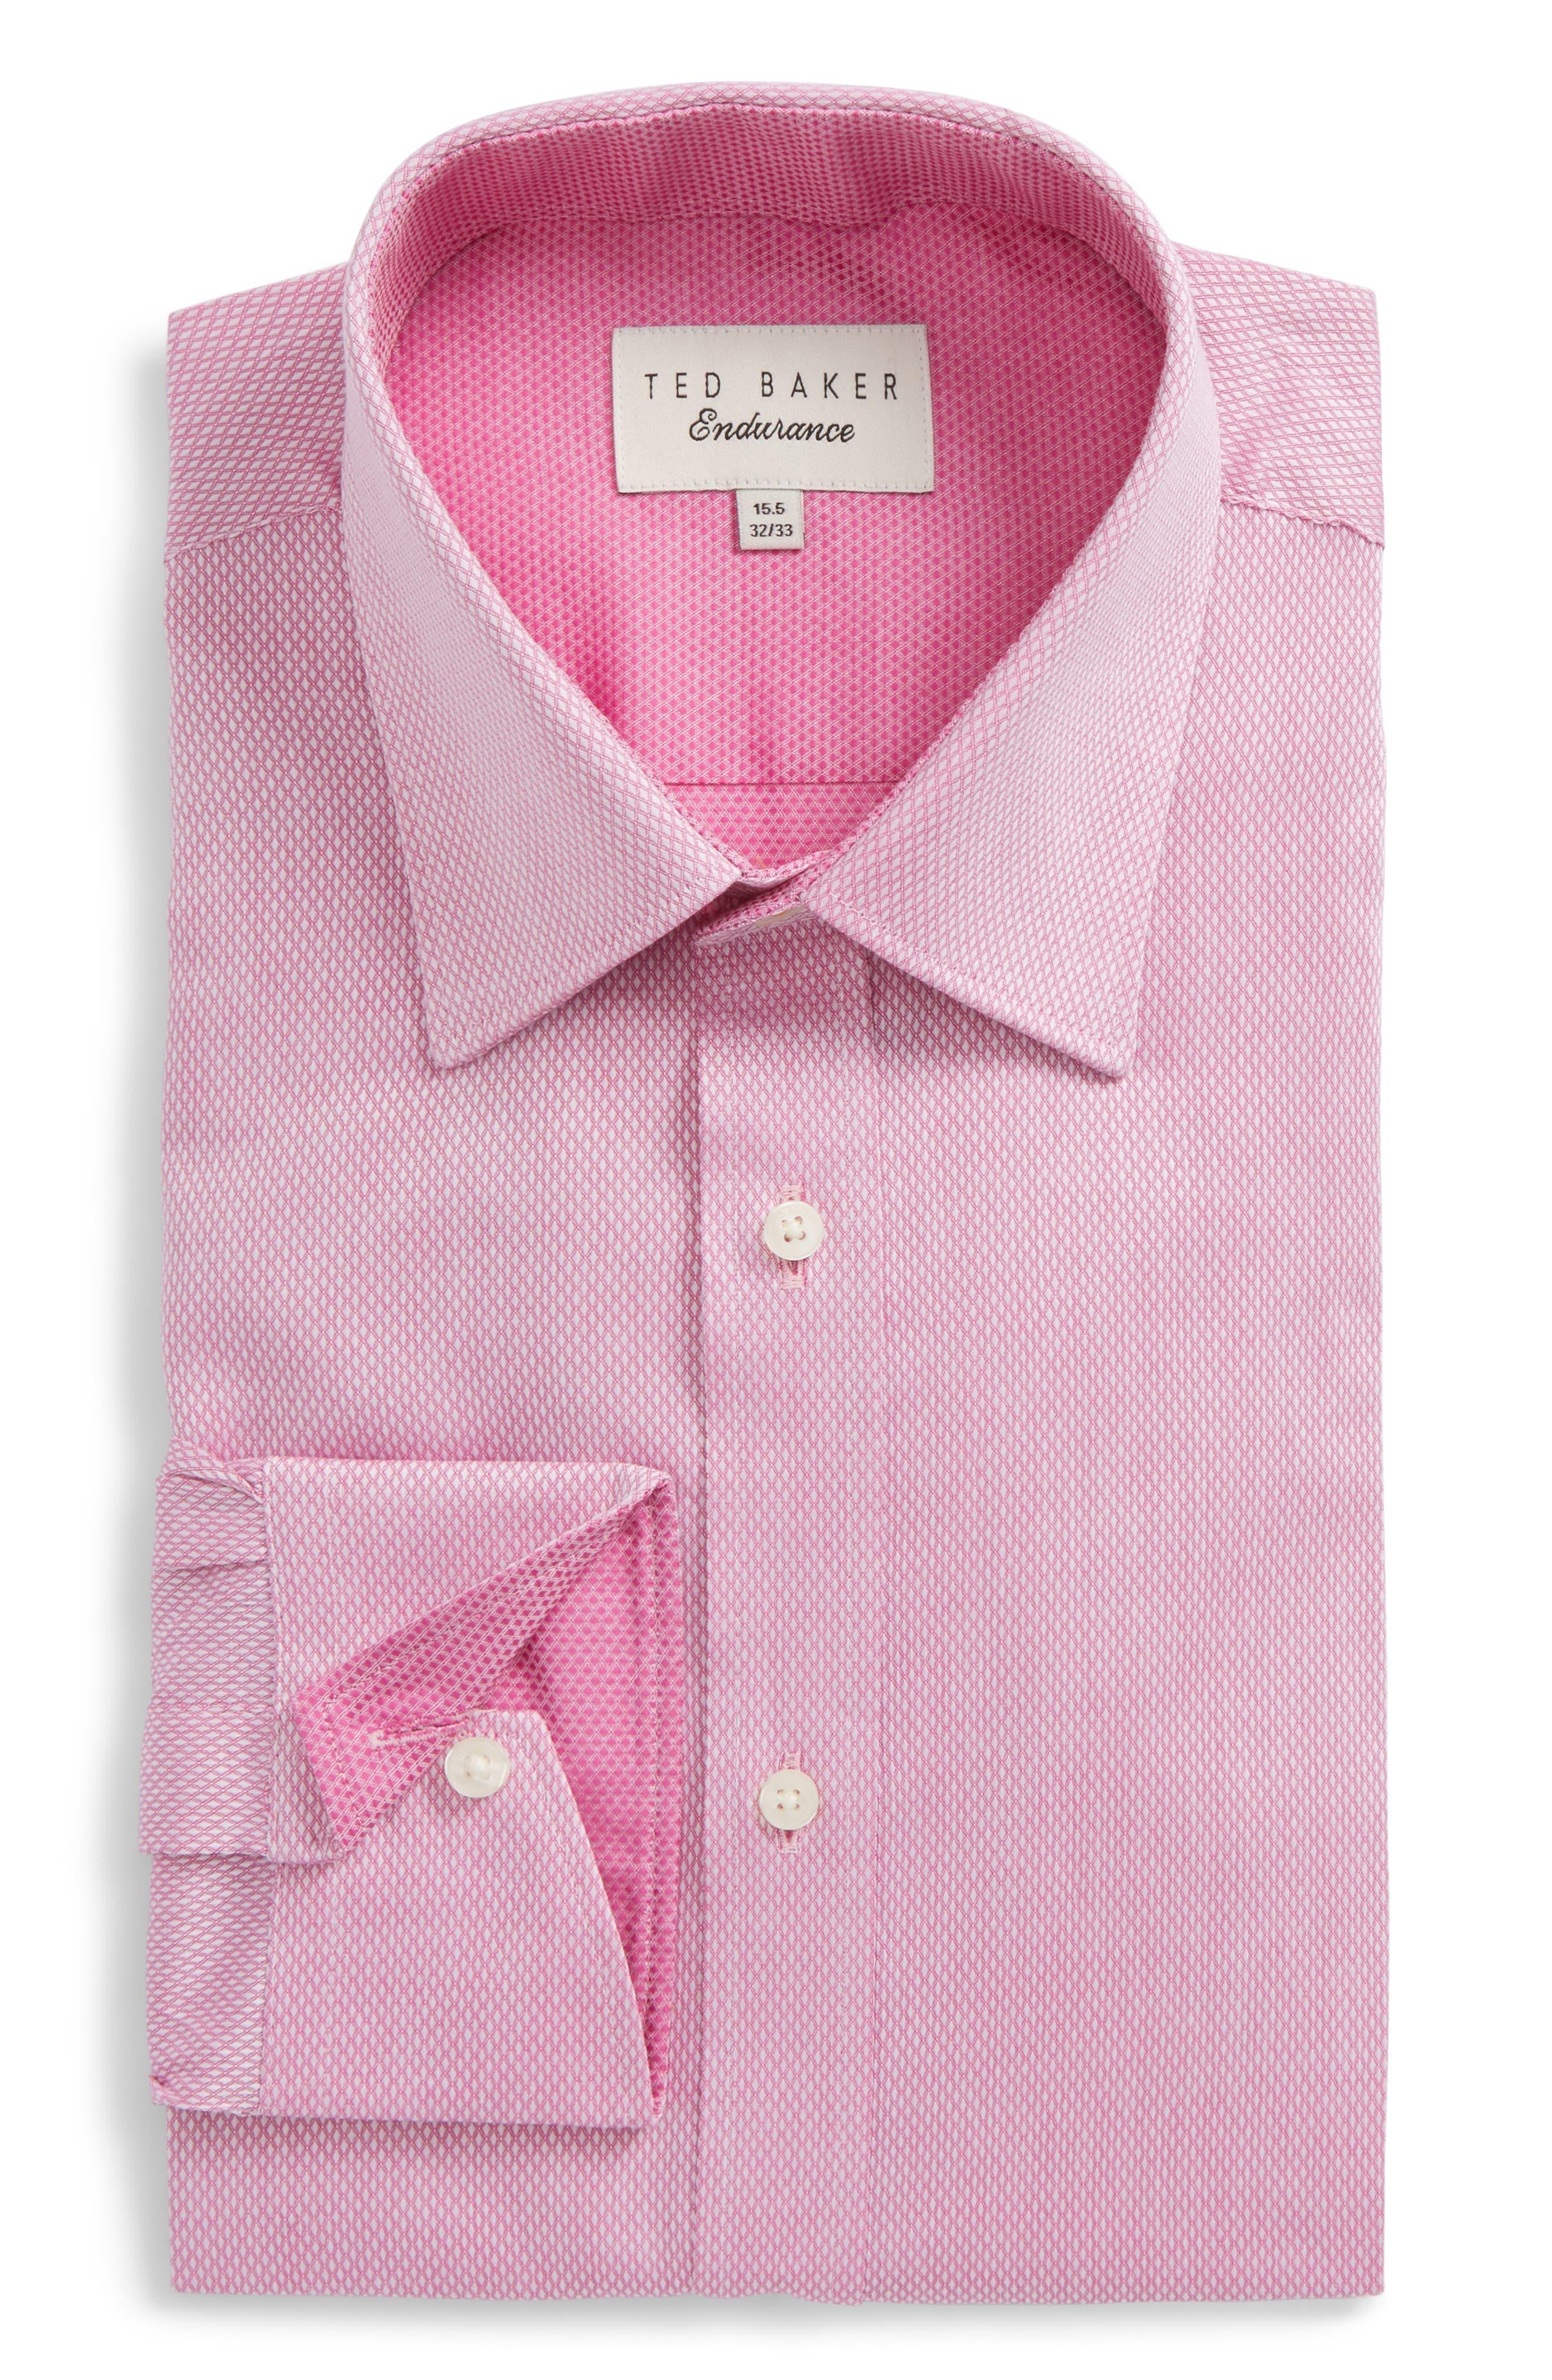 Lavindr Endurance Trim Fit Solid Dress Shirt,                             Main thumbnail 1, color,                             Pink